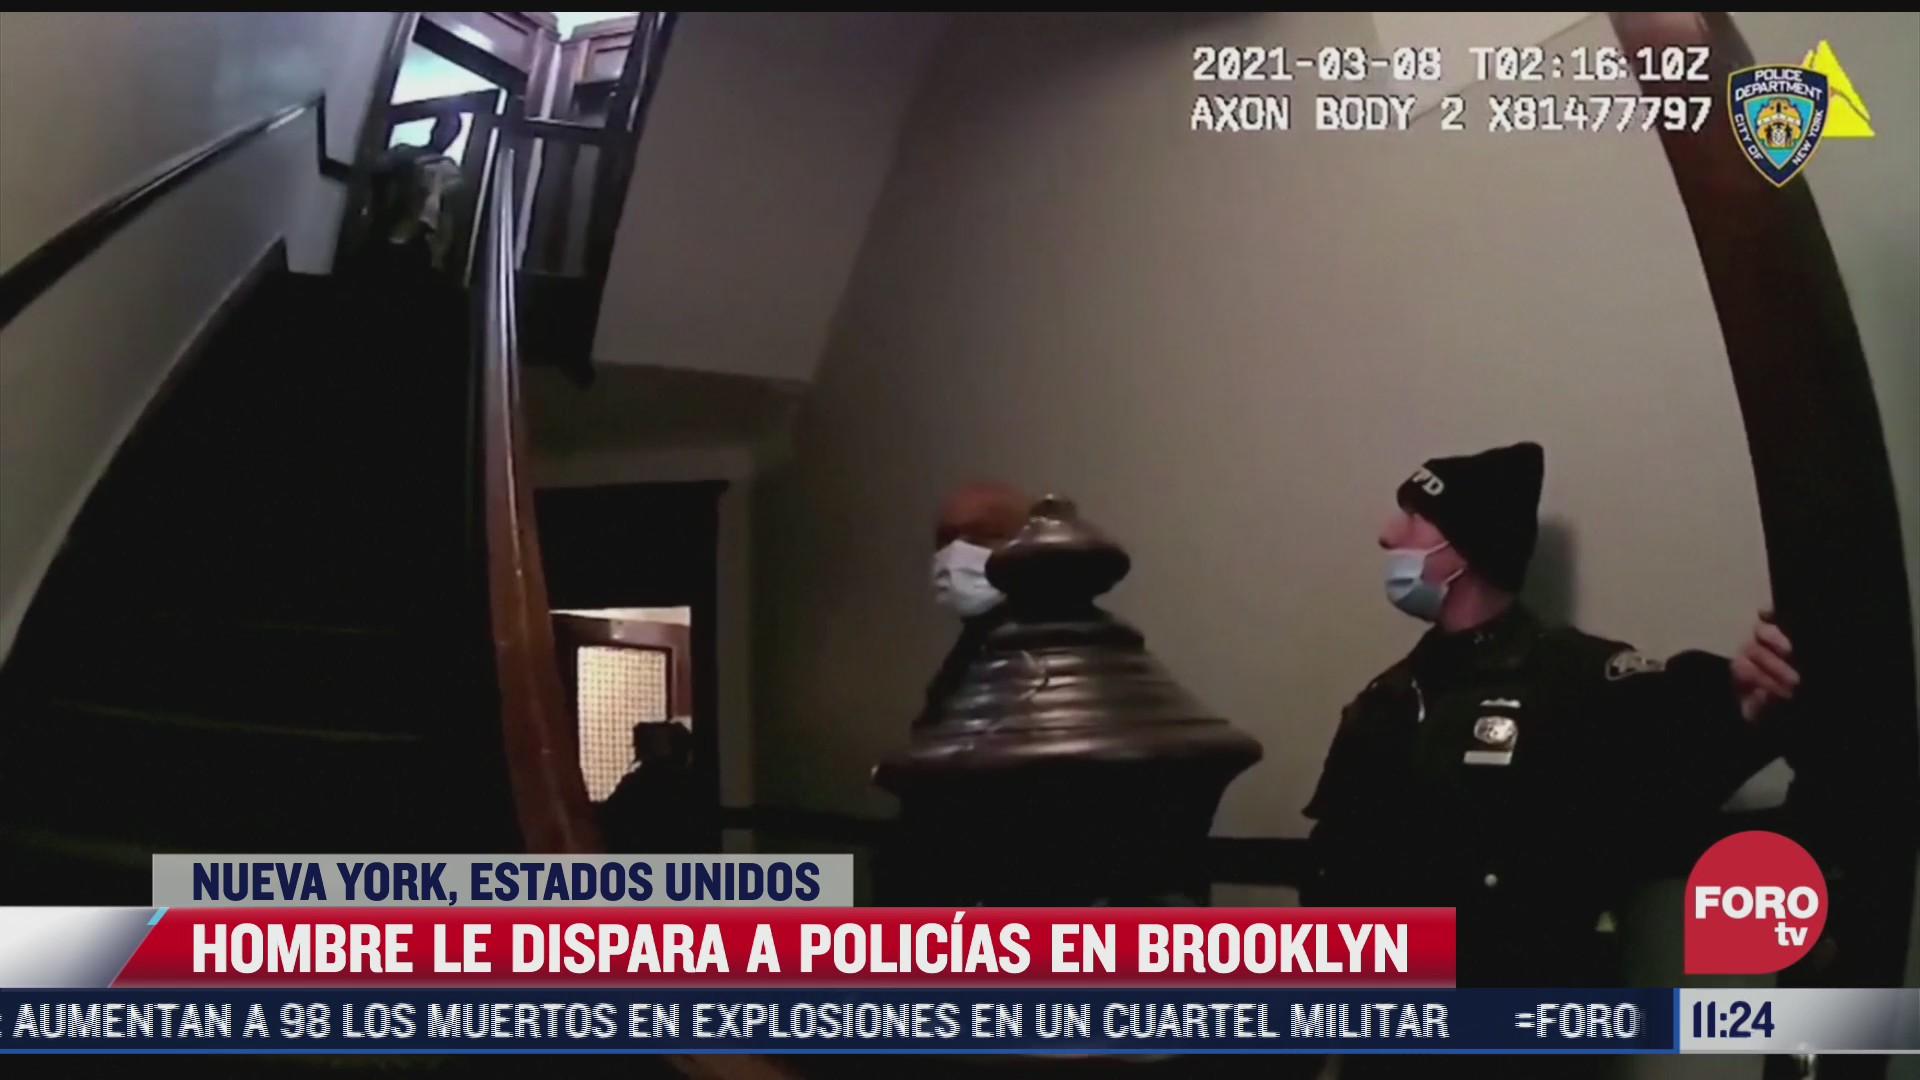 asi le dispara un hombre a policias en nueva york